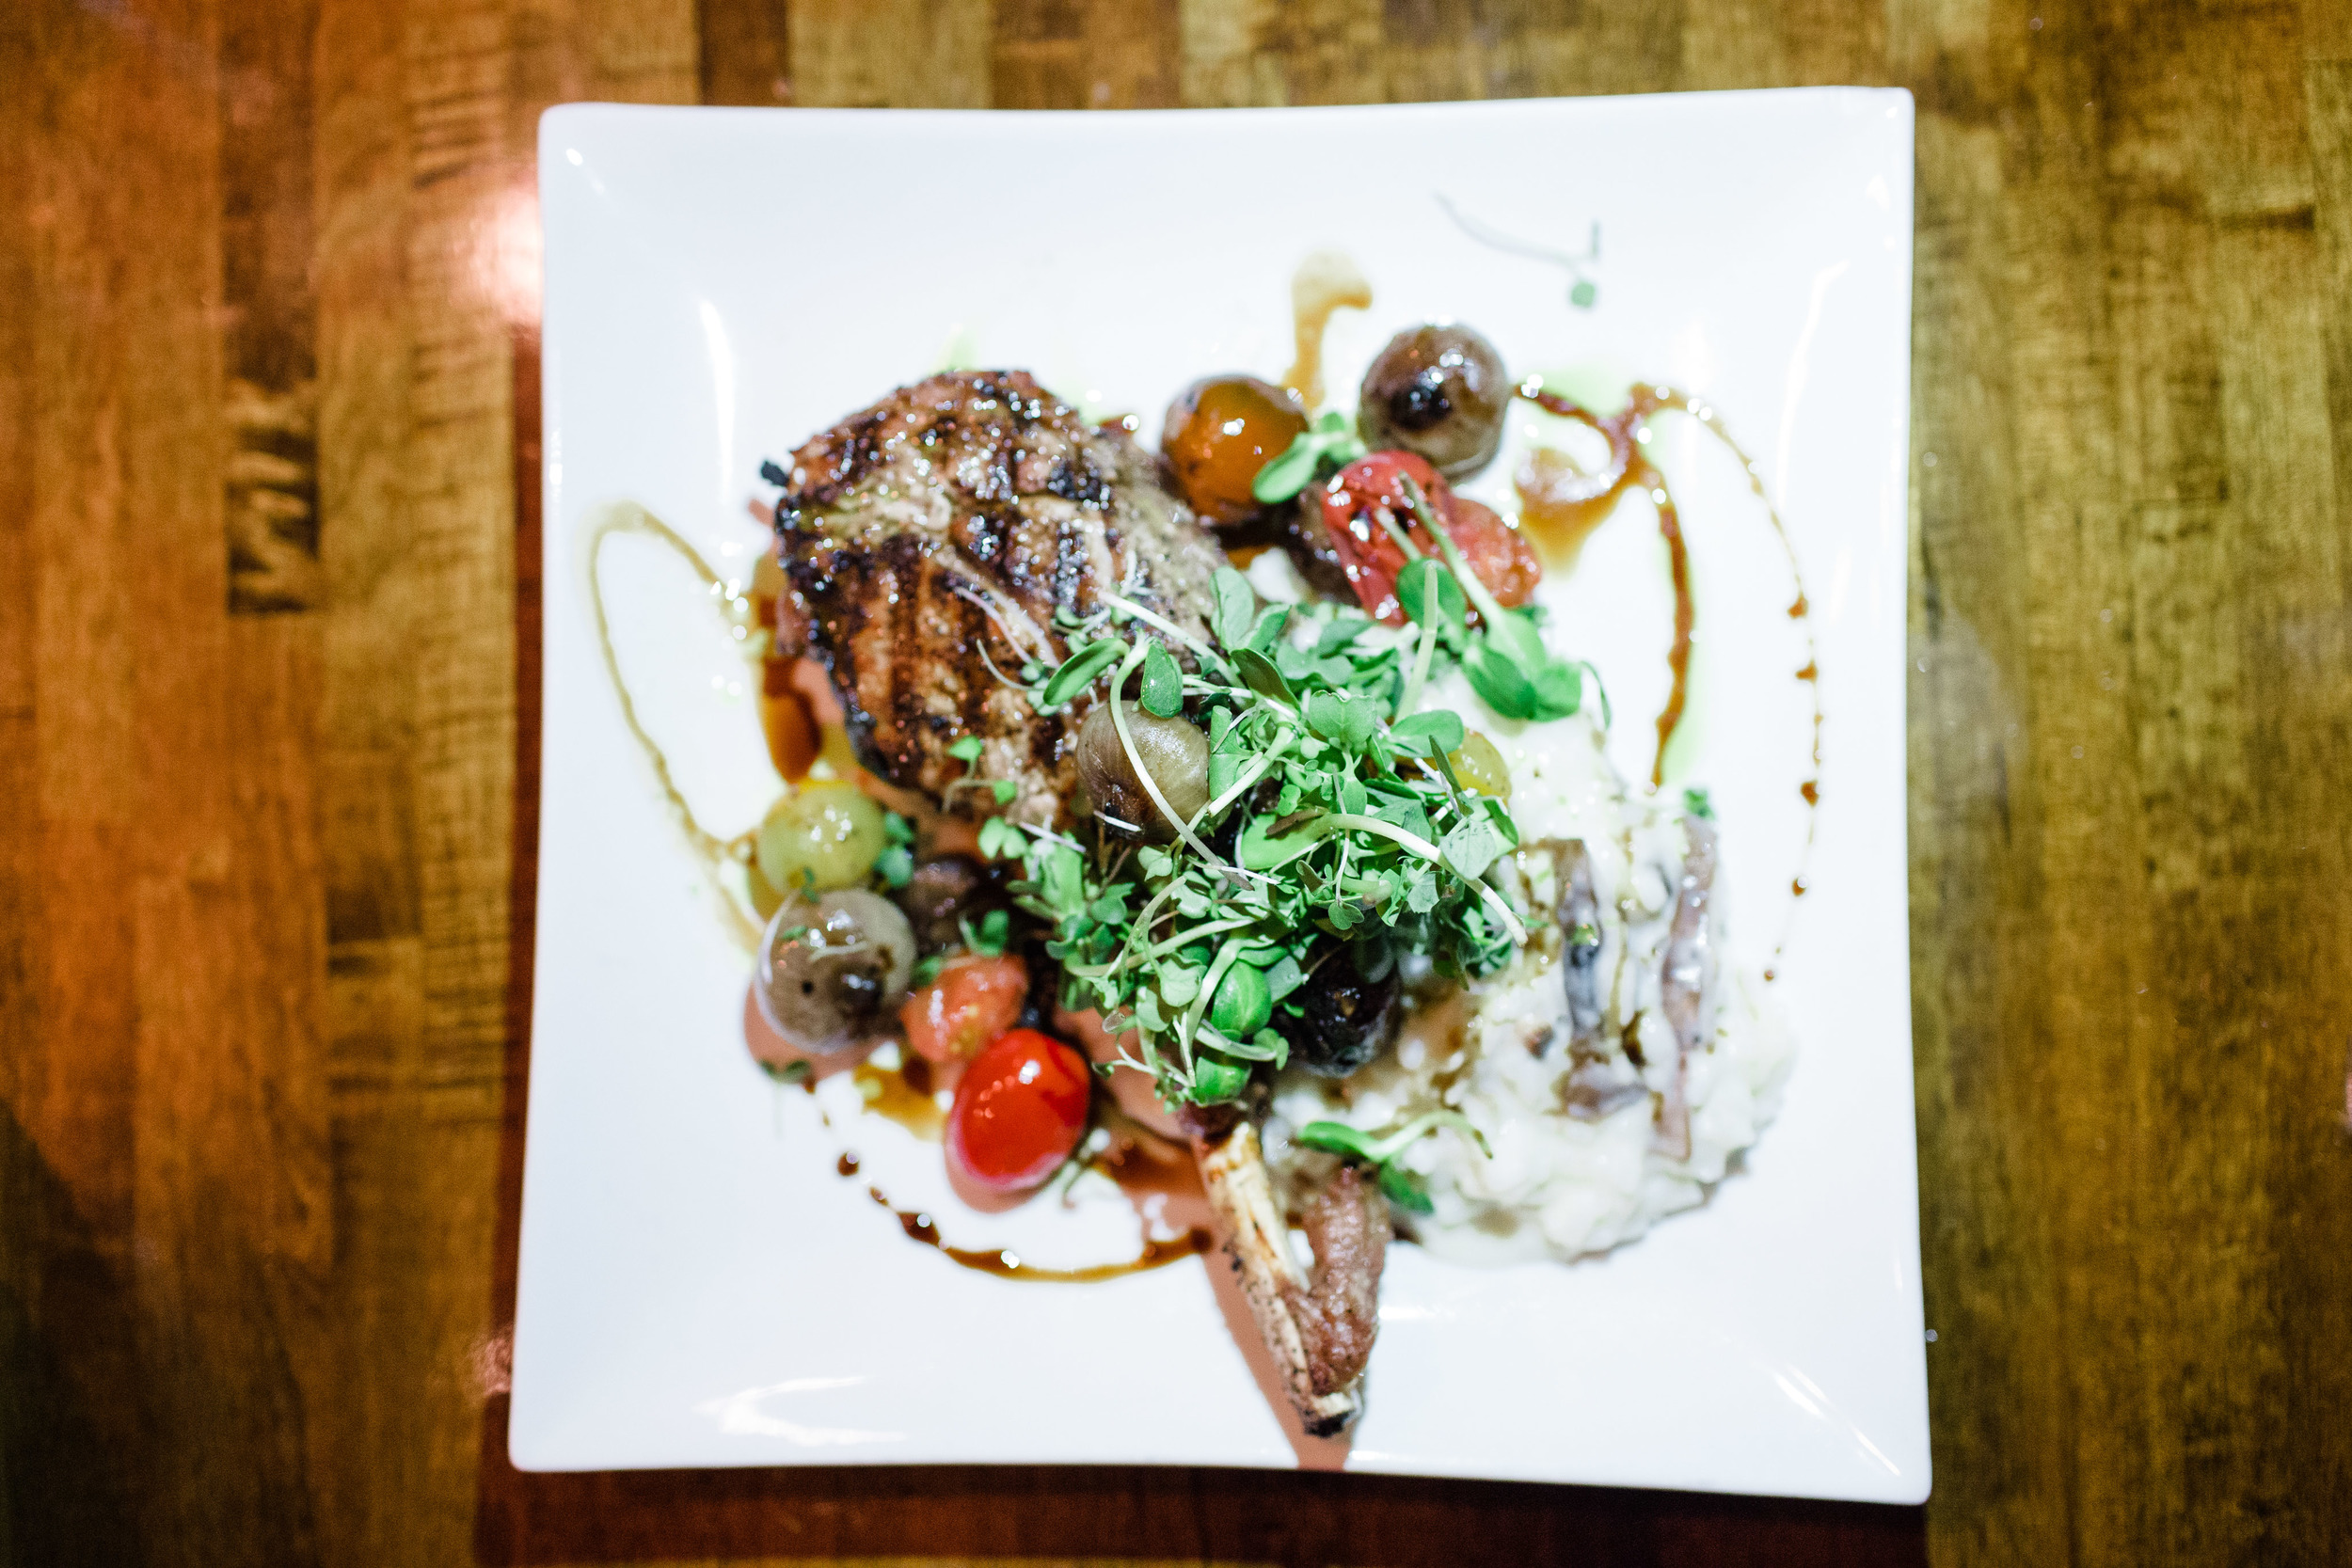 free range veal chop, creamy polenta + grilled cipollini onion + tomato